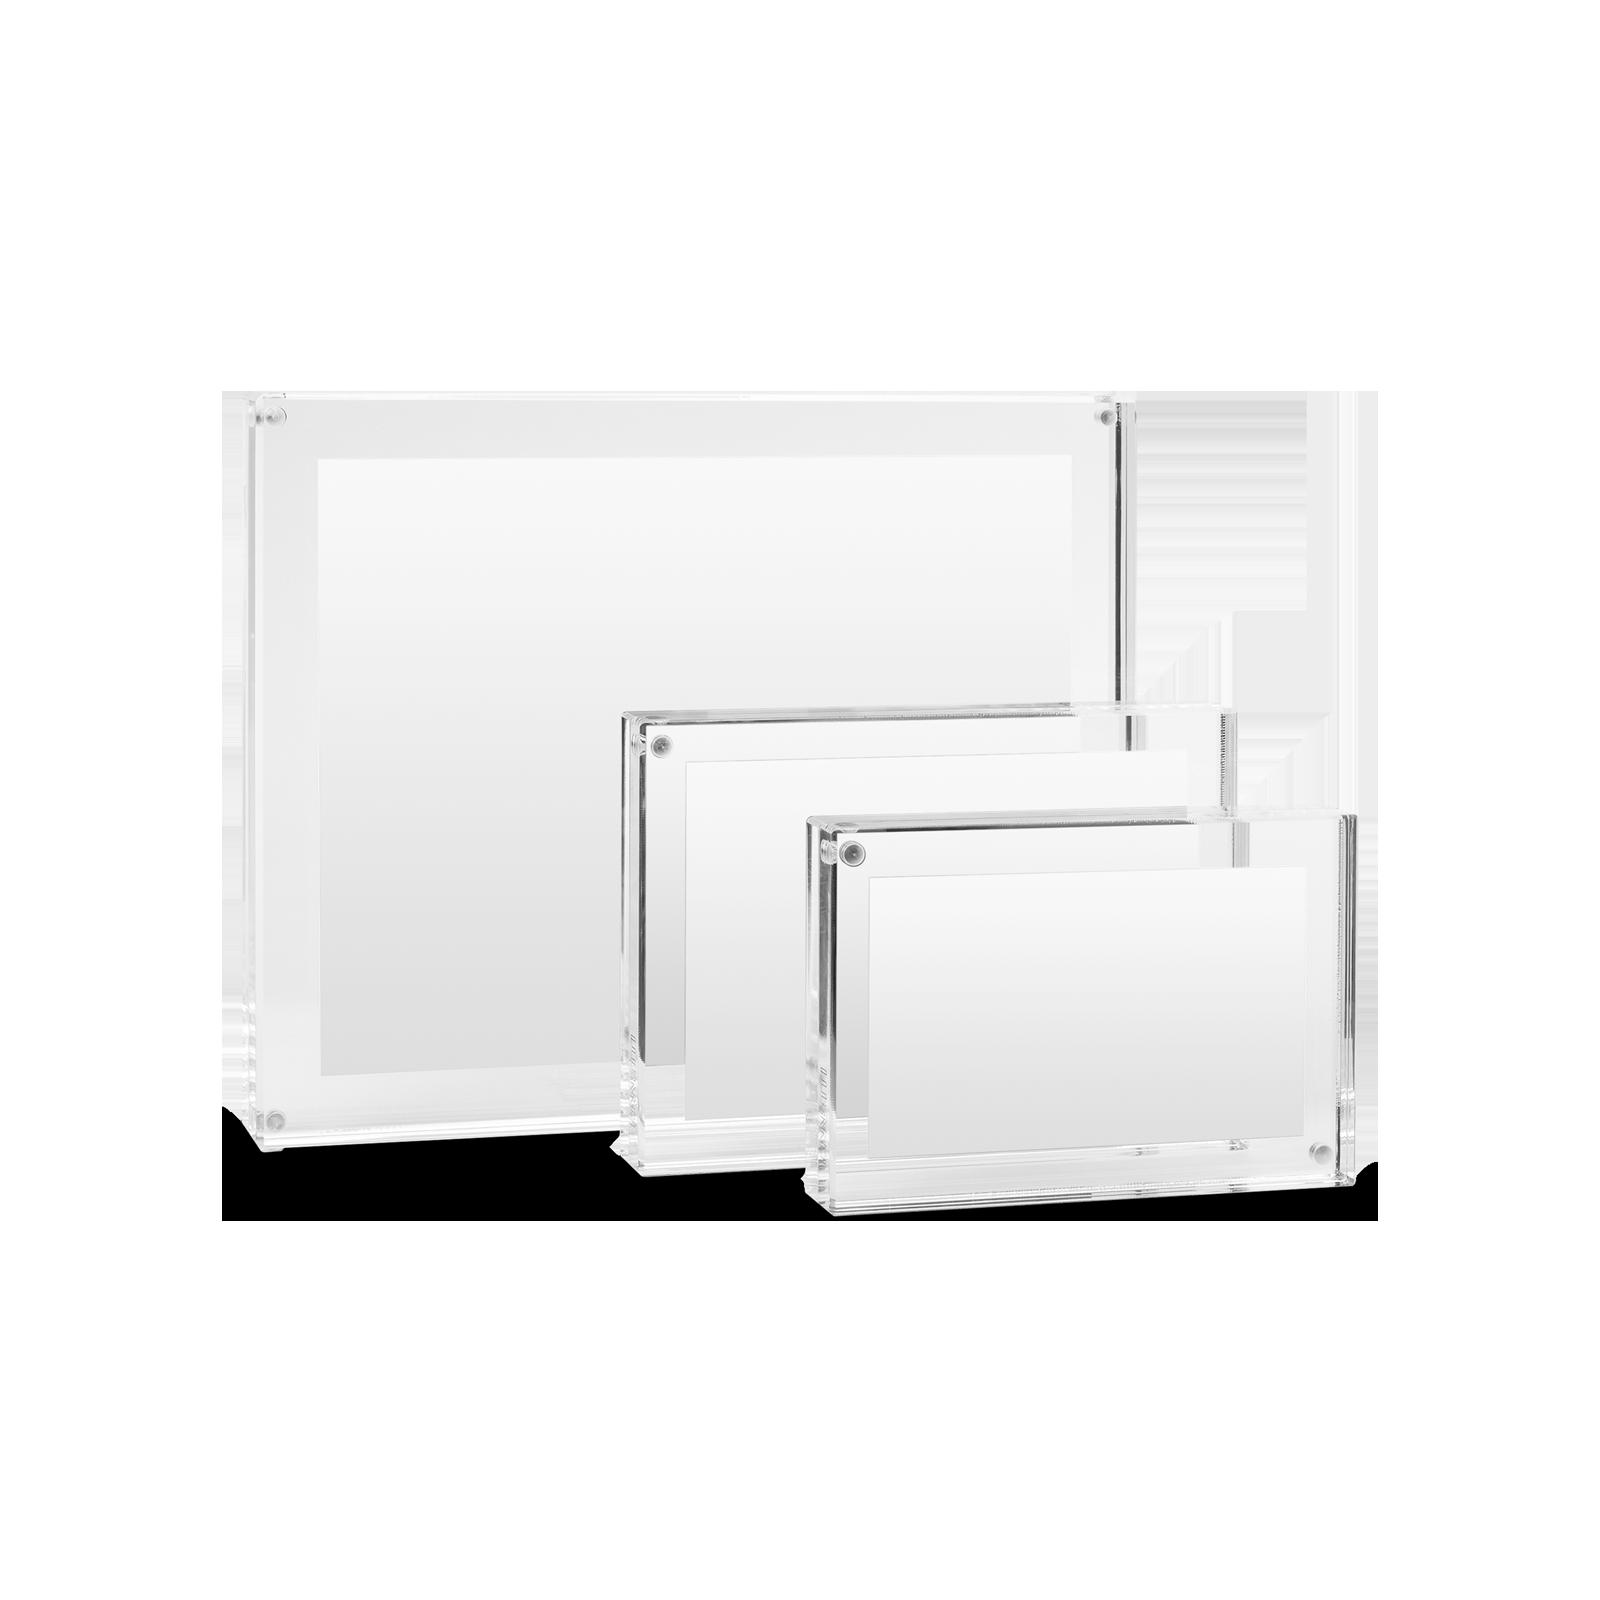 photo frame product photography